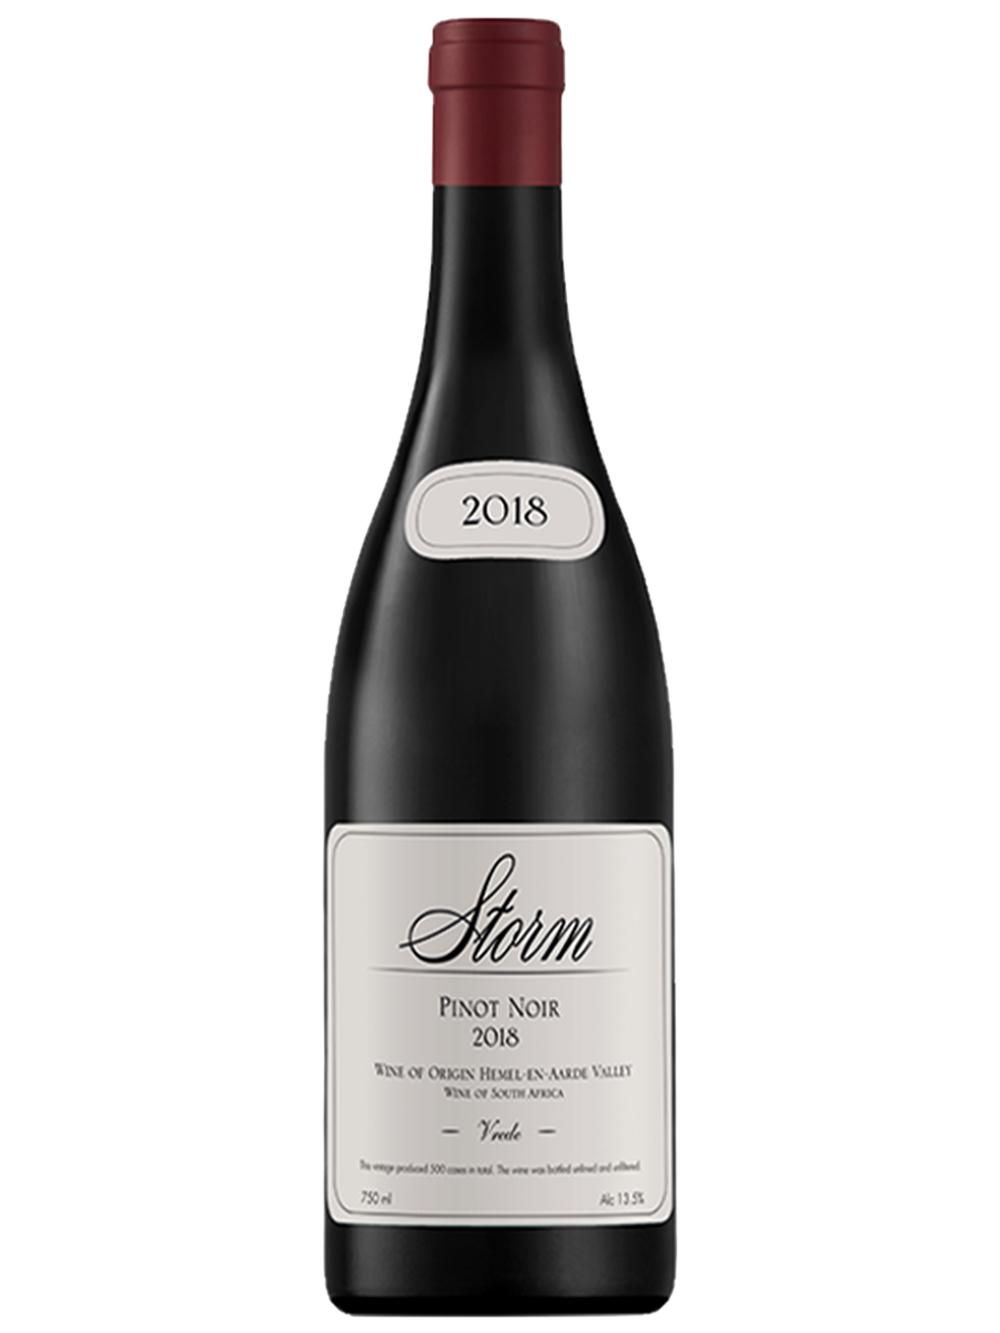 2018 Vrede Pinot Noir